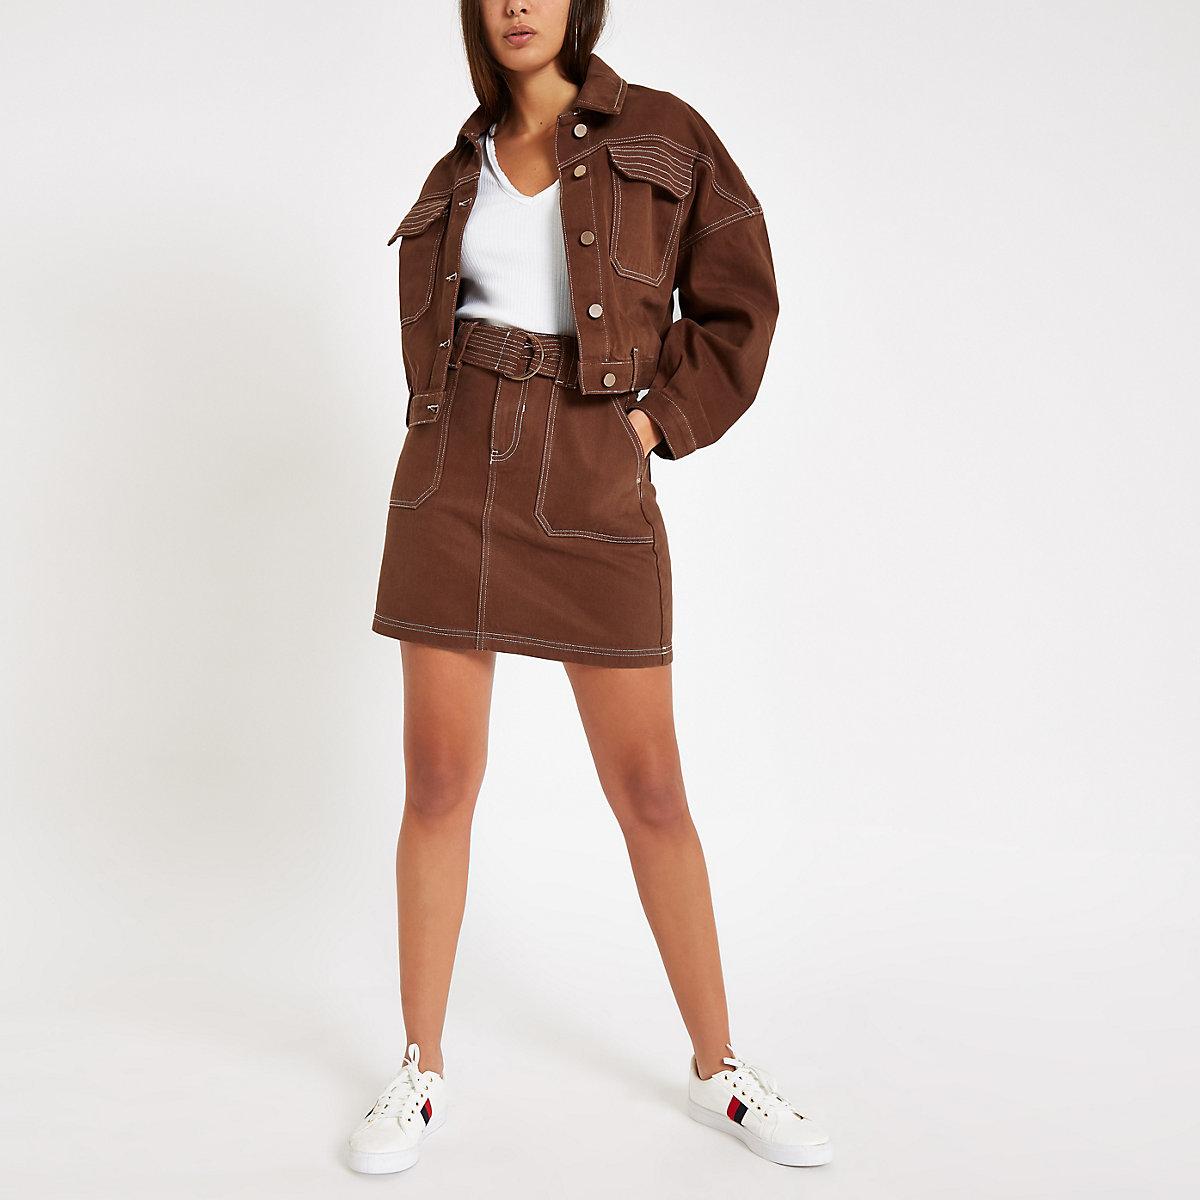 Brown utility denim skirt